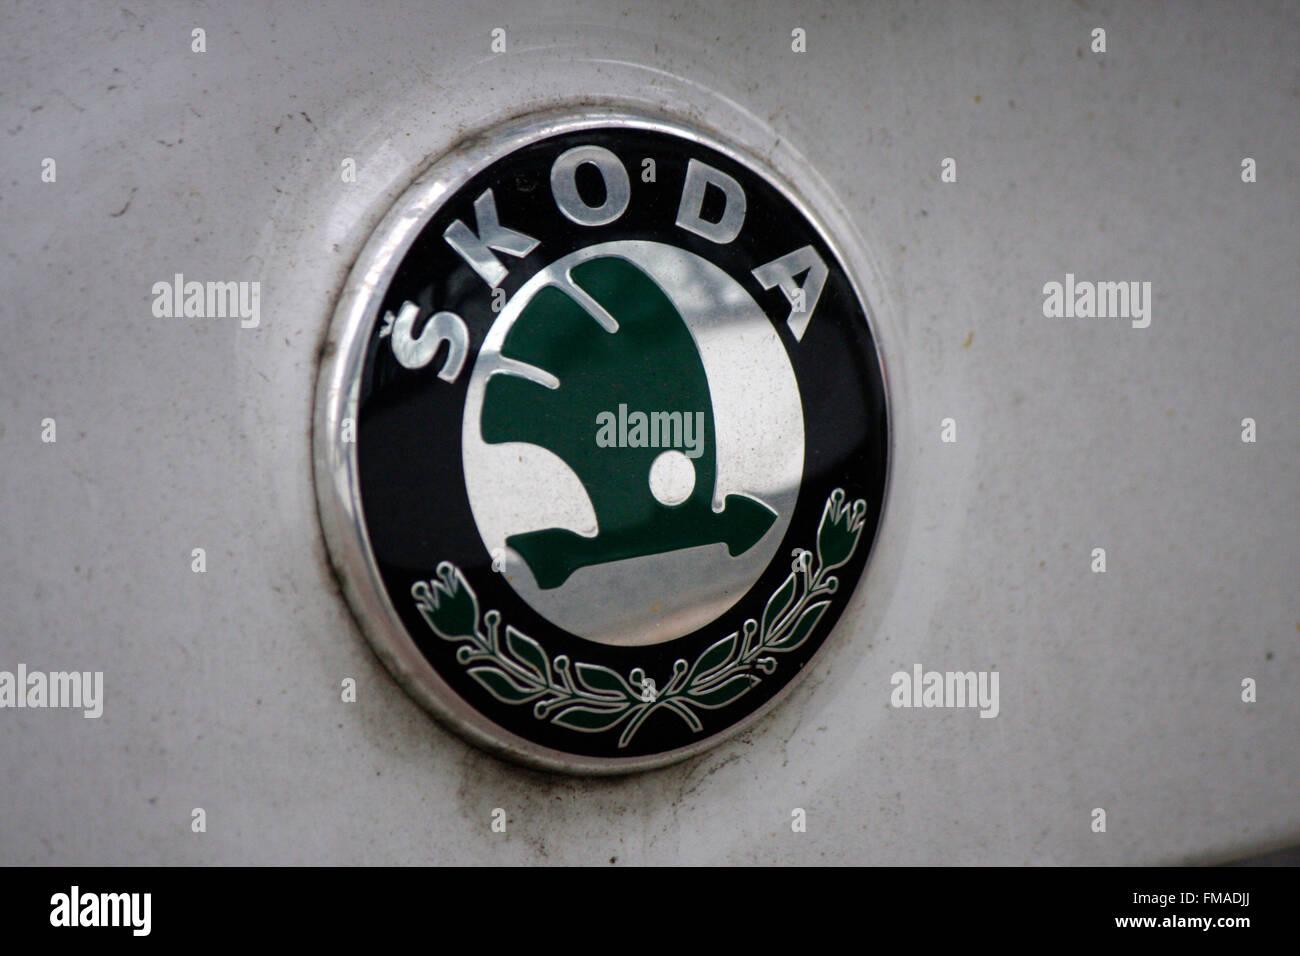 Markenname: 'Skoda', Dezember 2013, Berlin. - Stock Image